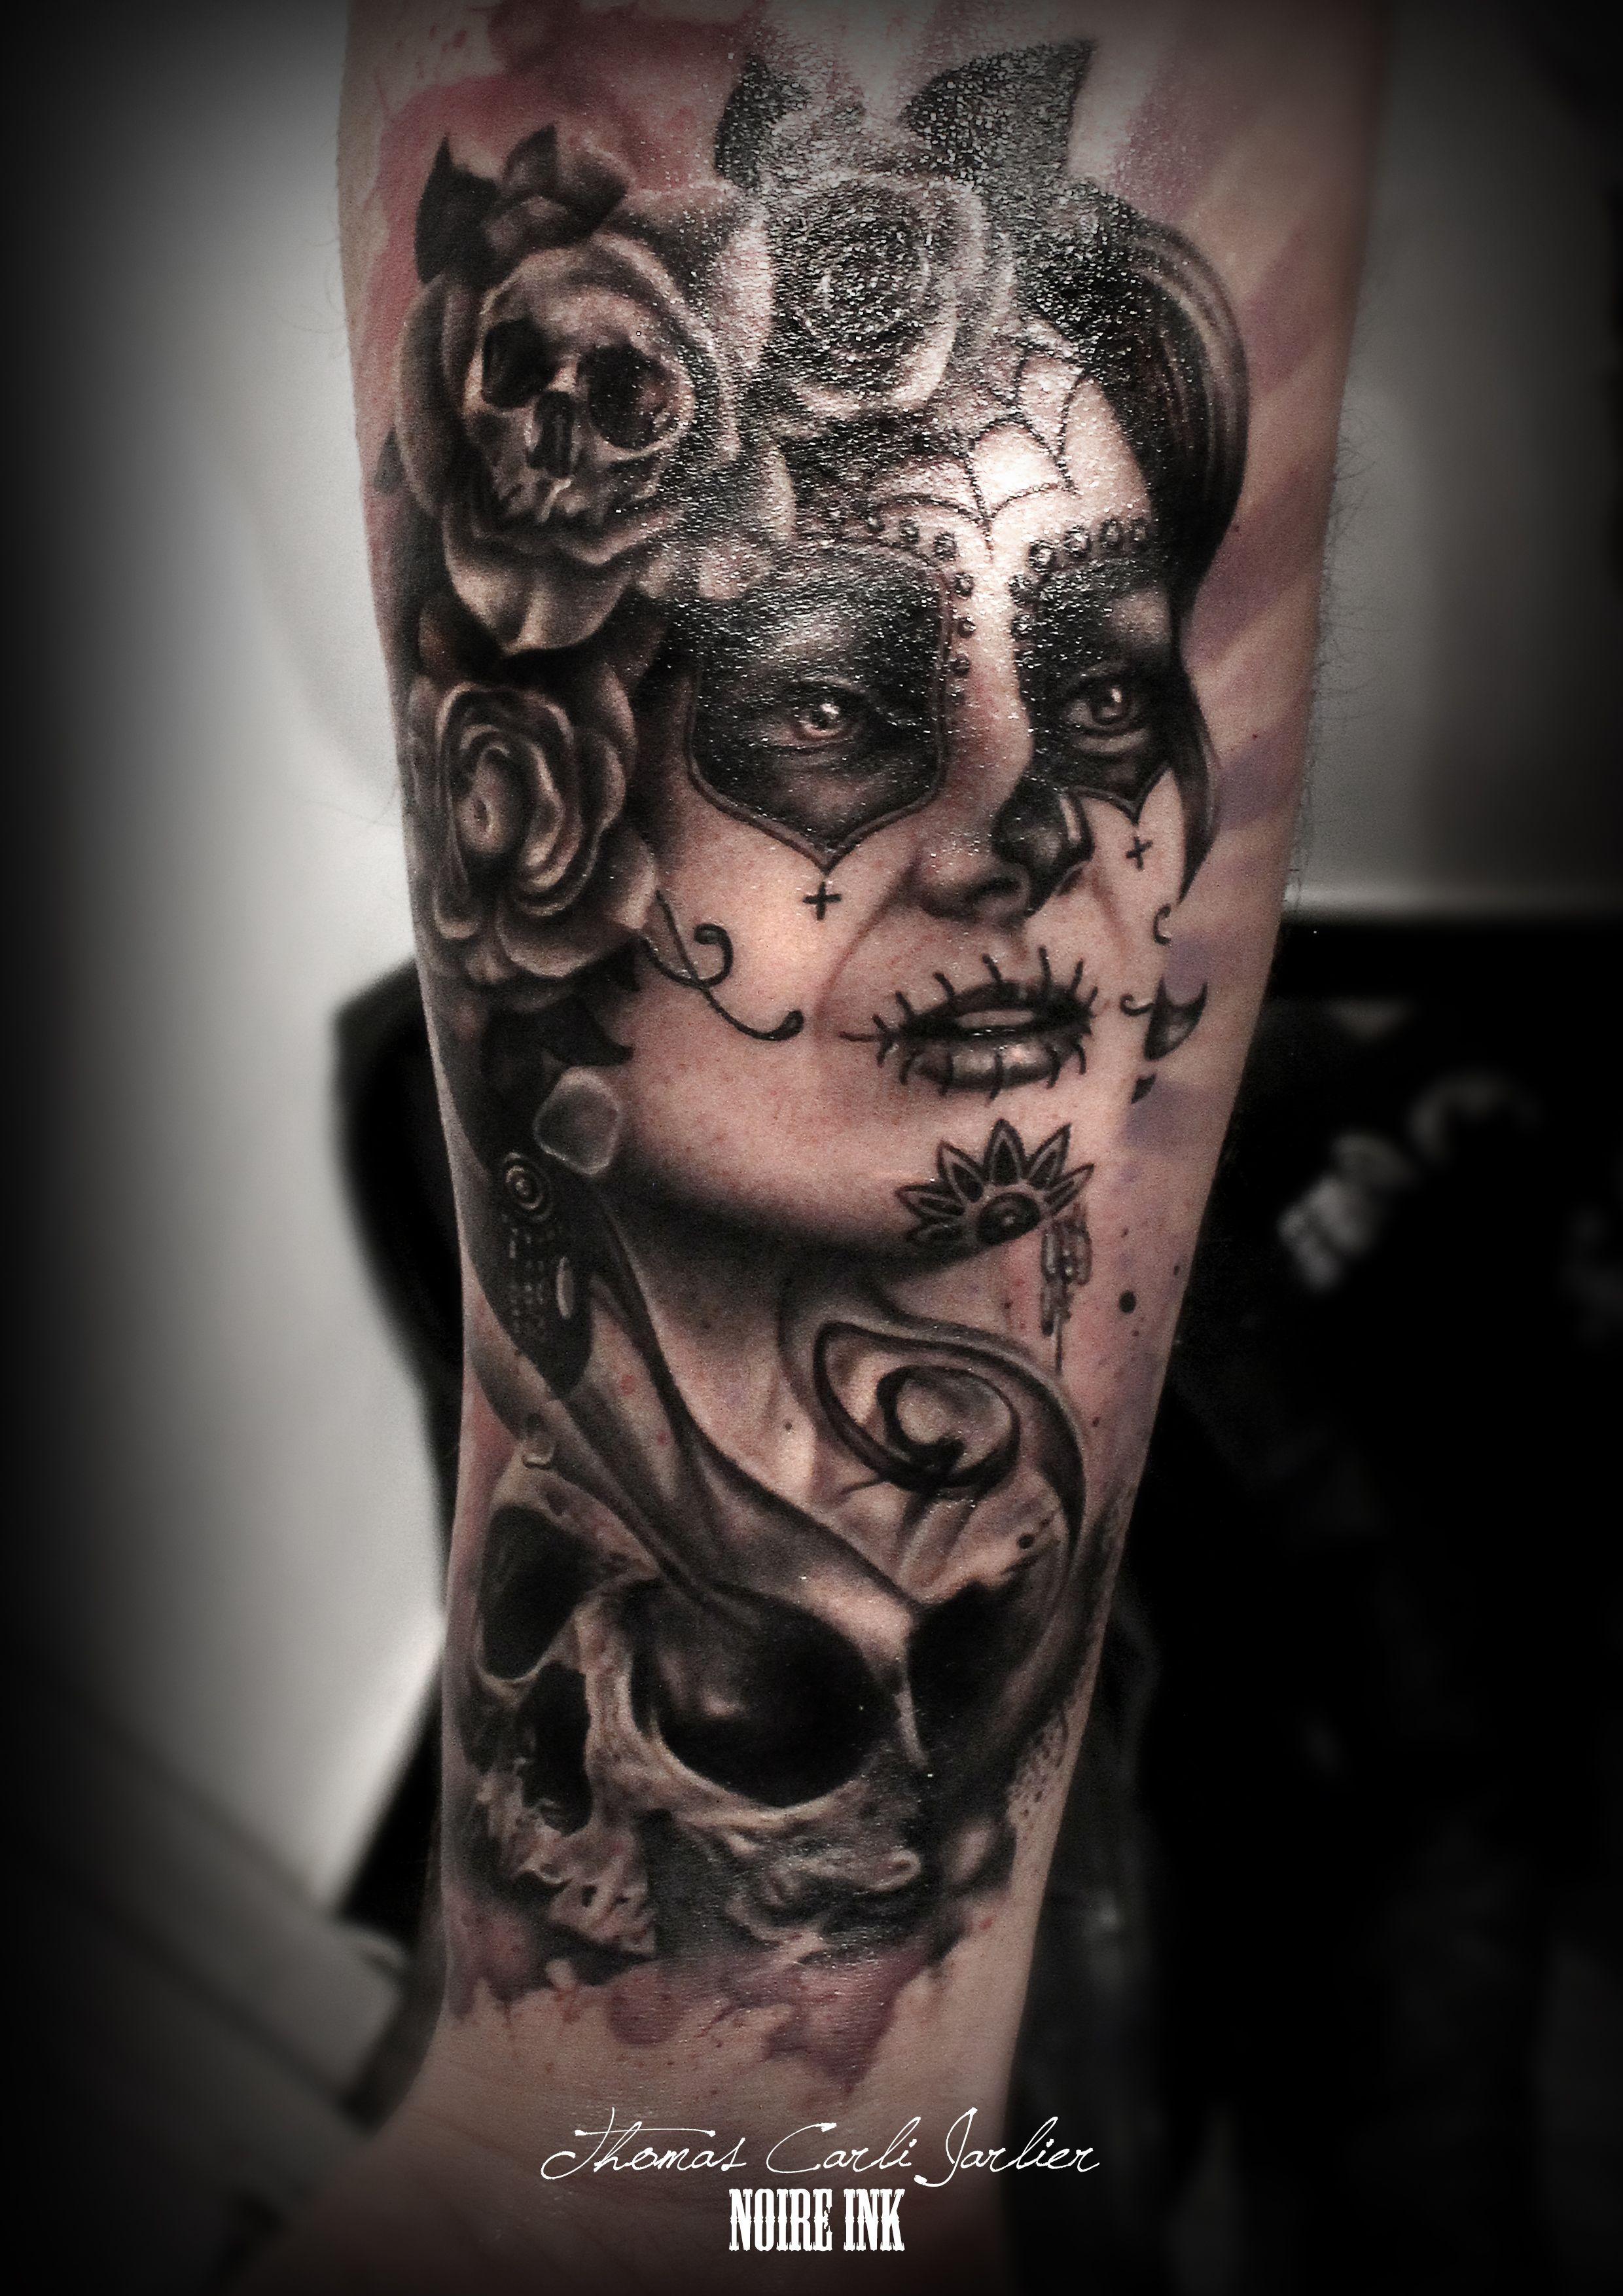 Afficher l 39 image d 39 origine tattoo catrina pinterest - Tatouage gitane signification ...